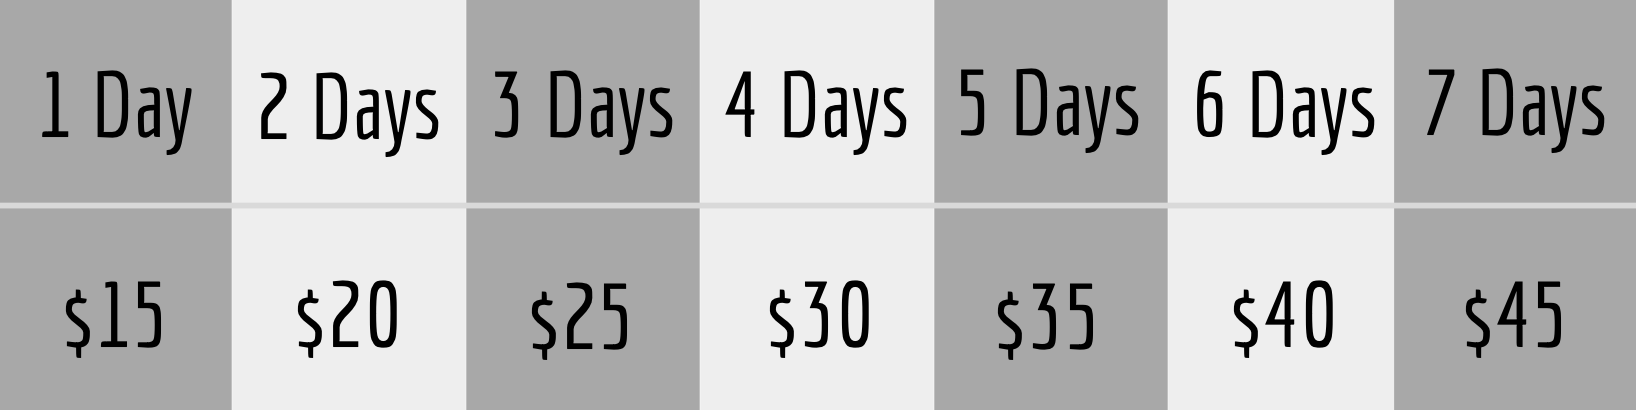 studio boise camera rental pricing